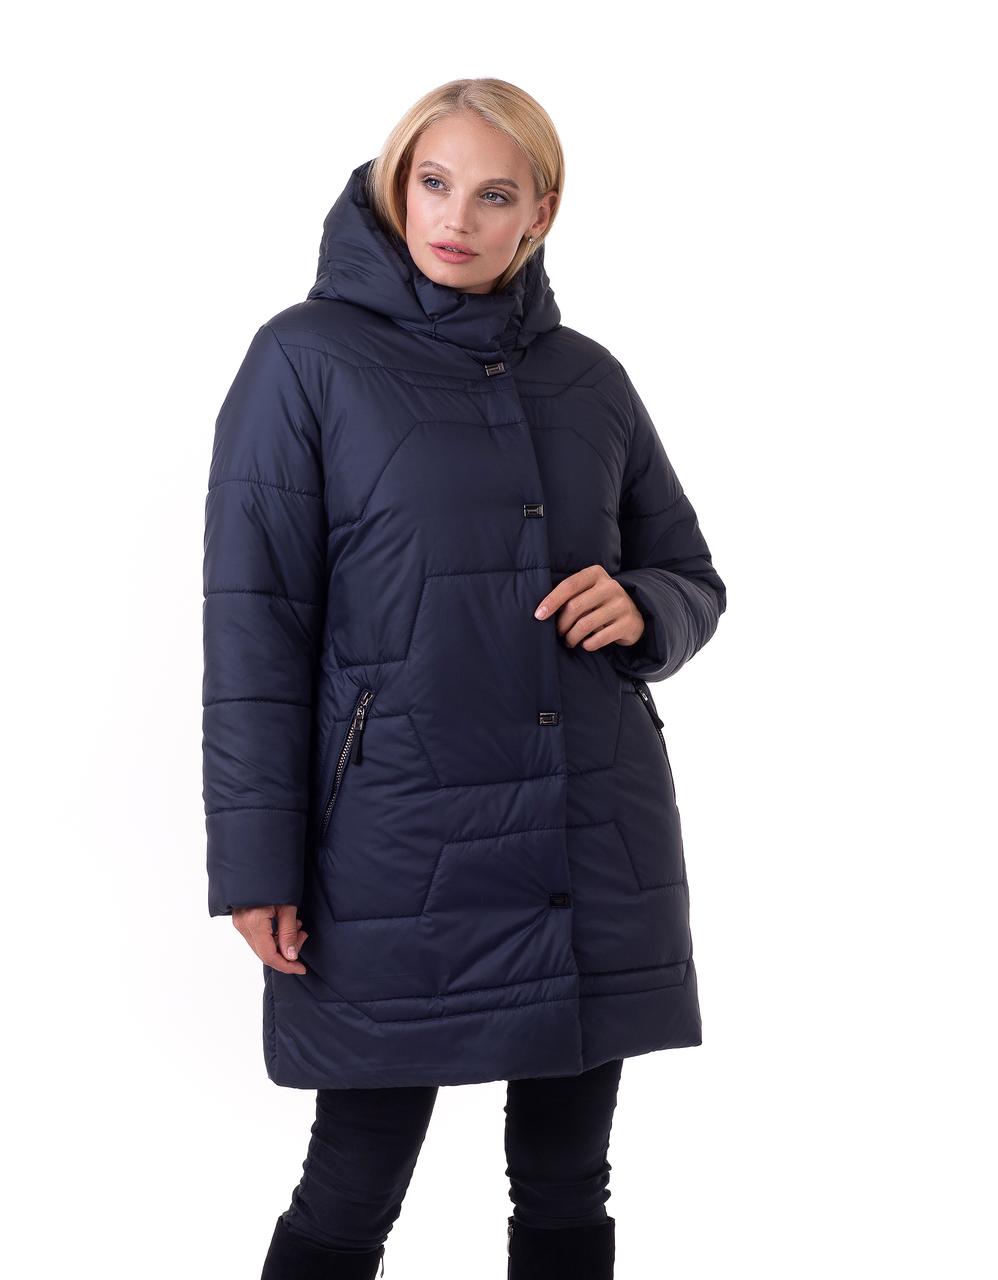 Зимняя куртка от производителя Украина без меха